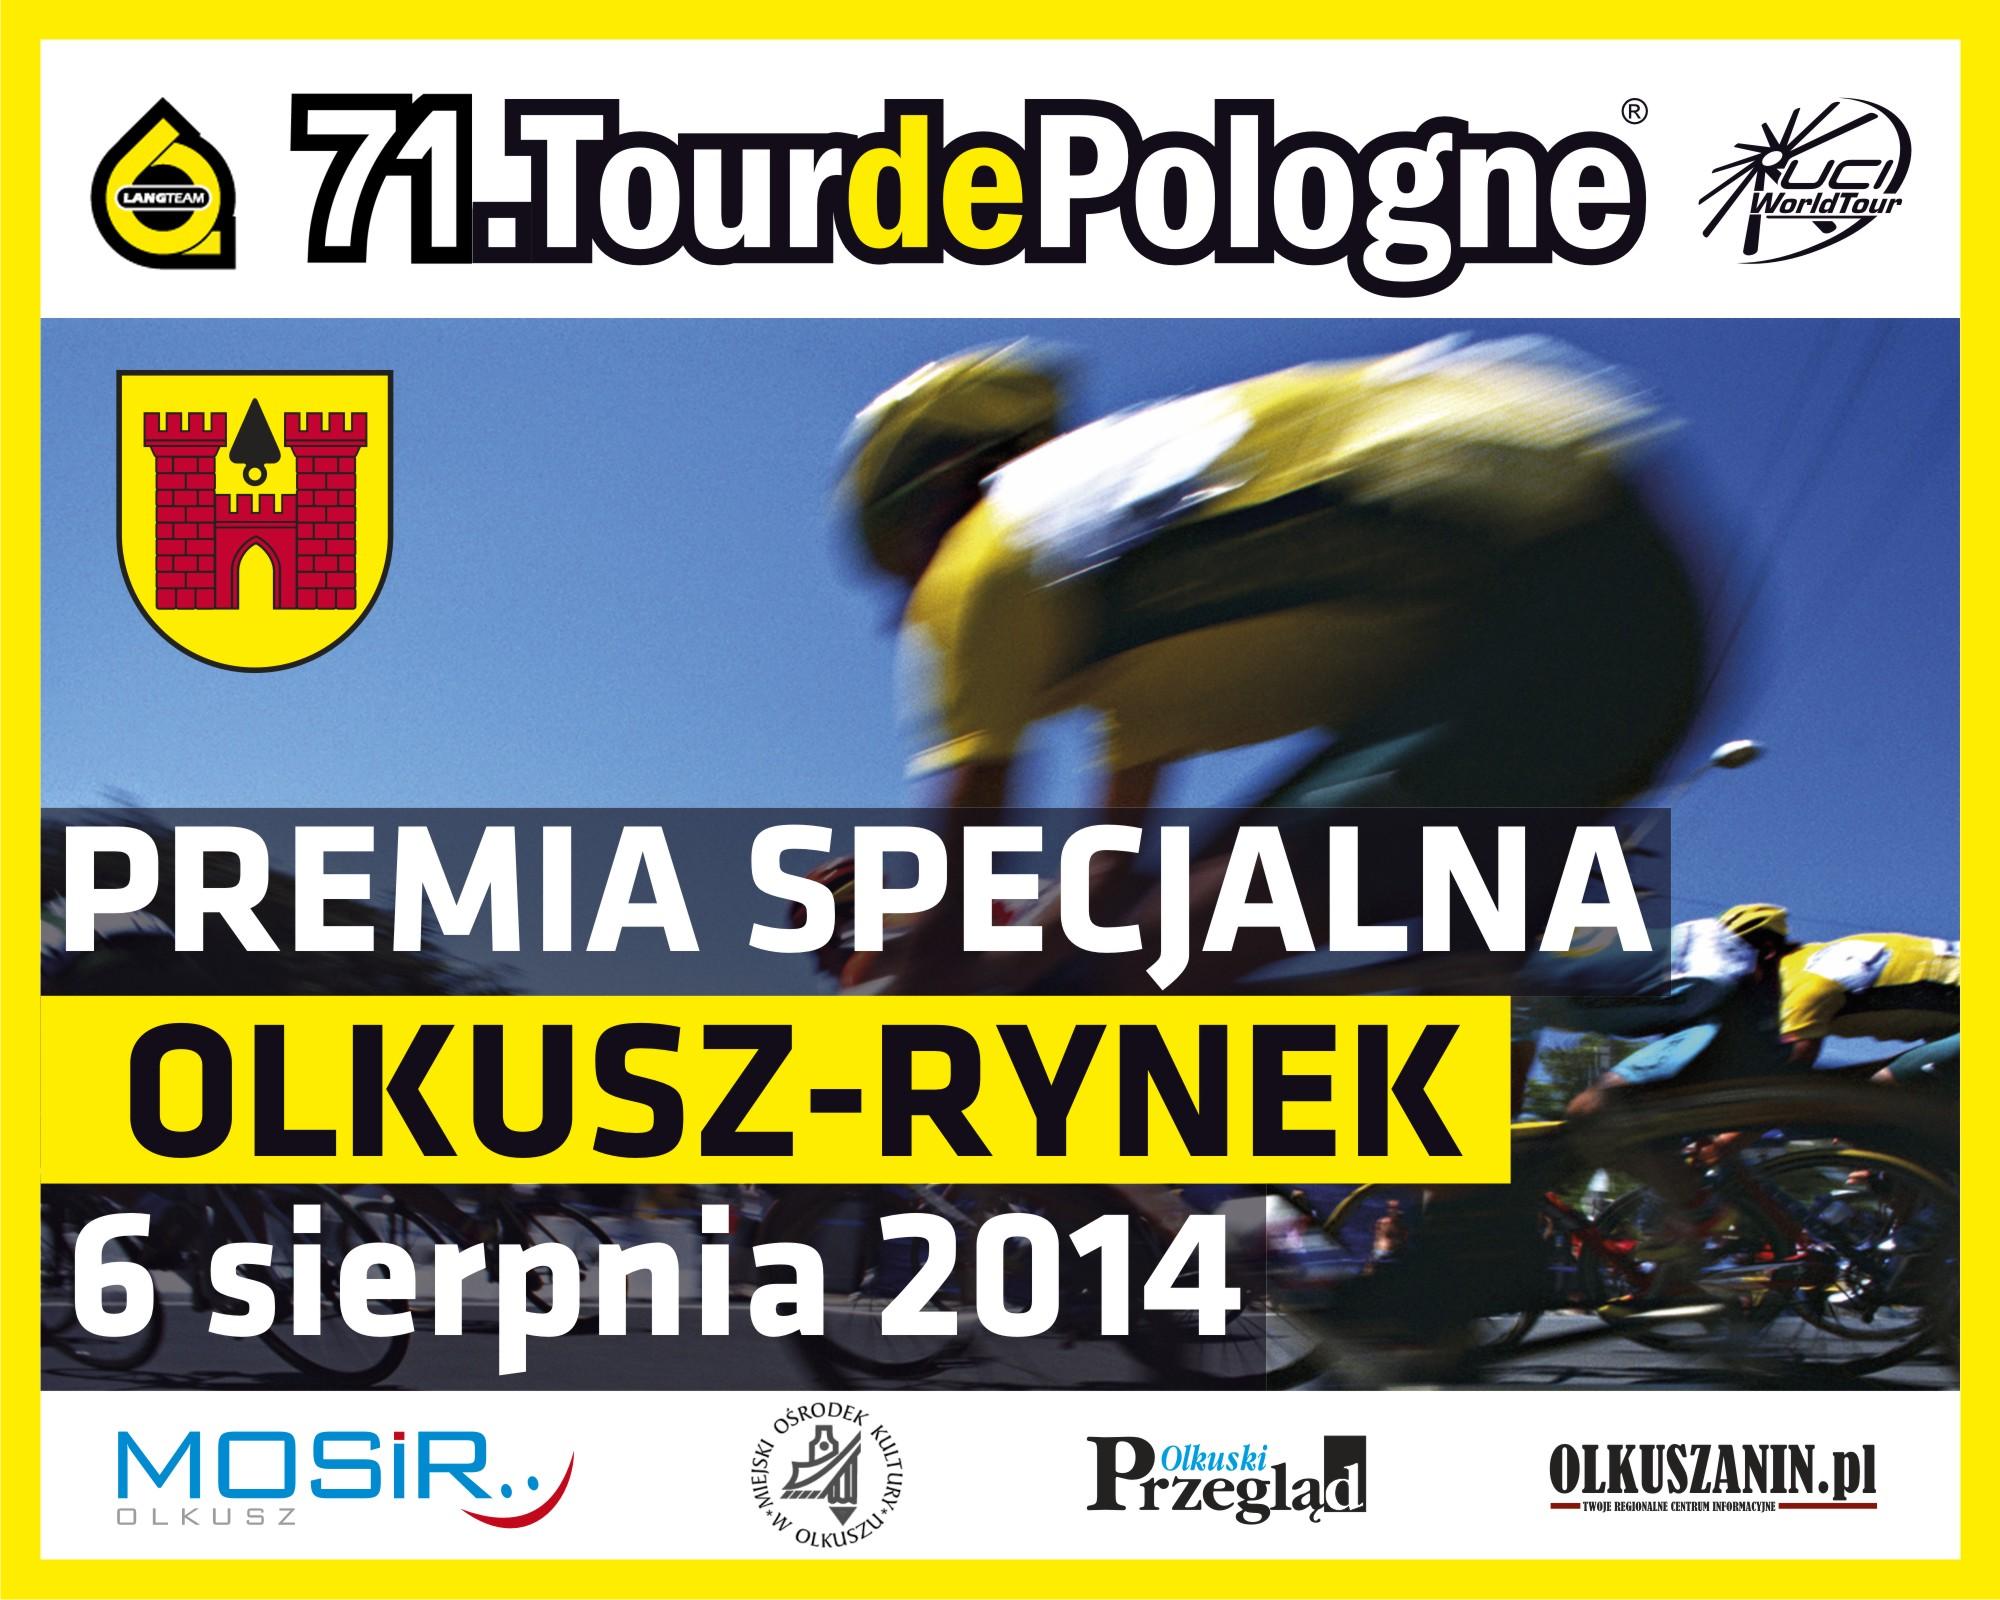 Plakat promujący 71 tour de pologne w Olkuszu